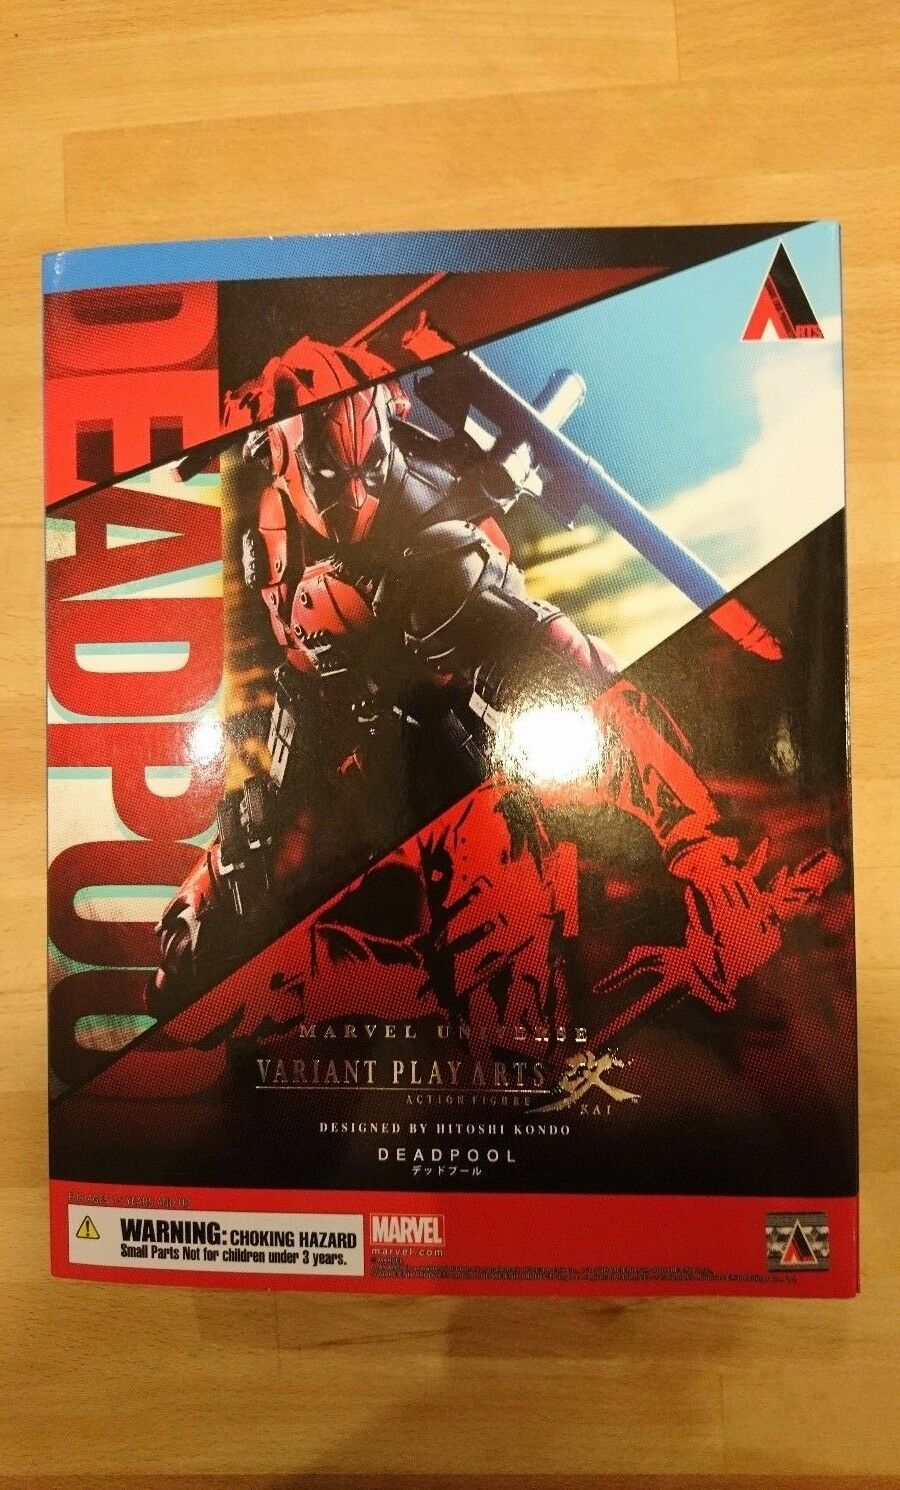 Square Enix Play Arts Kai Variant Marvel Deadpool Figure Genuine BNIB in UK